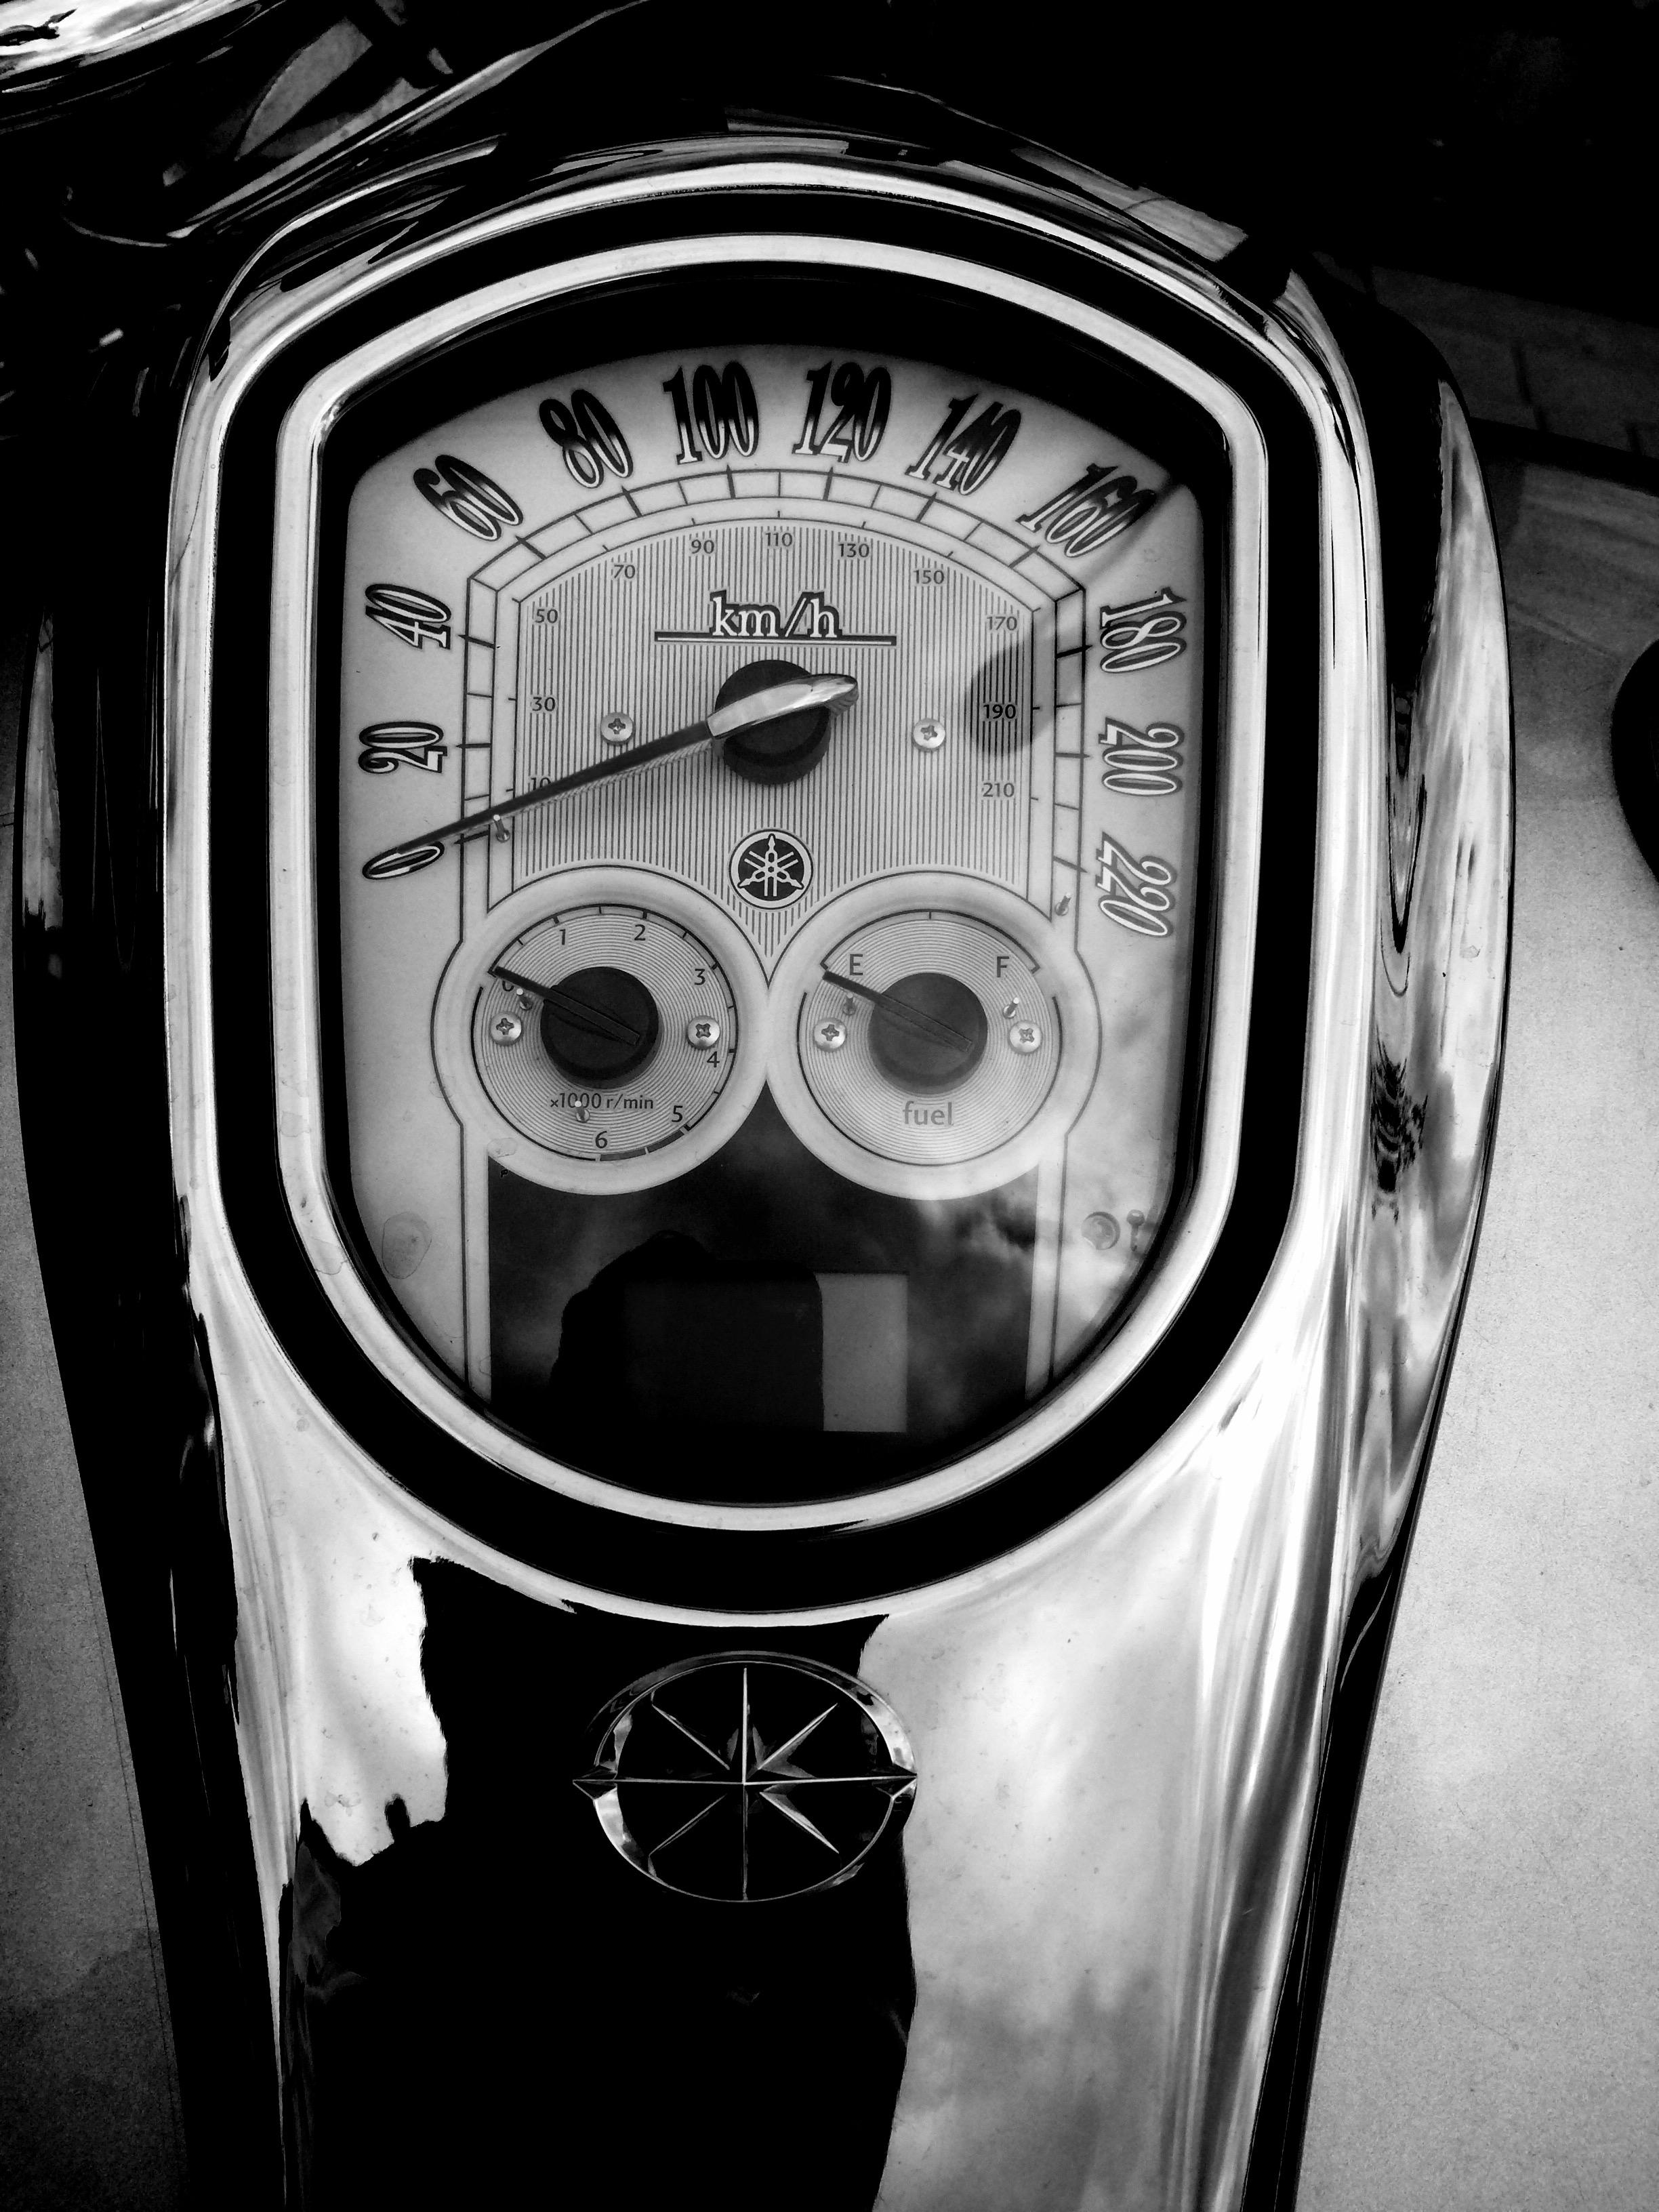 Viewfinder - close up kilometerteller